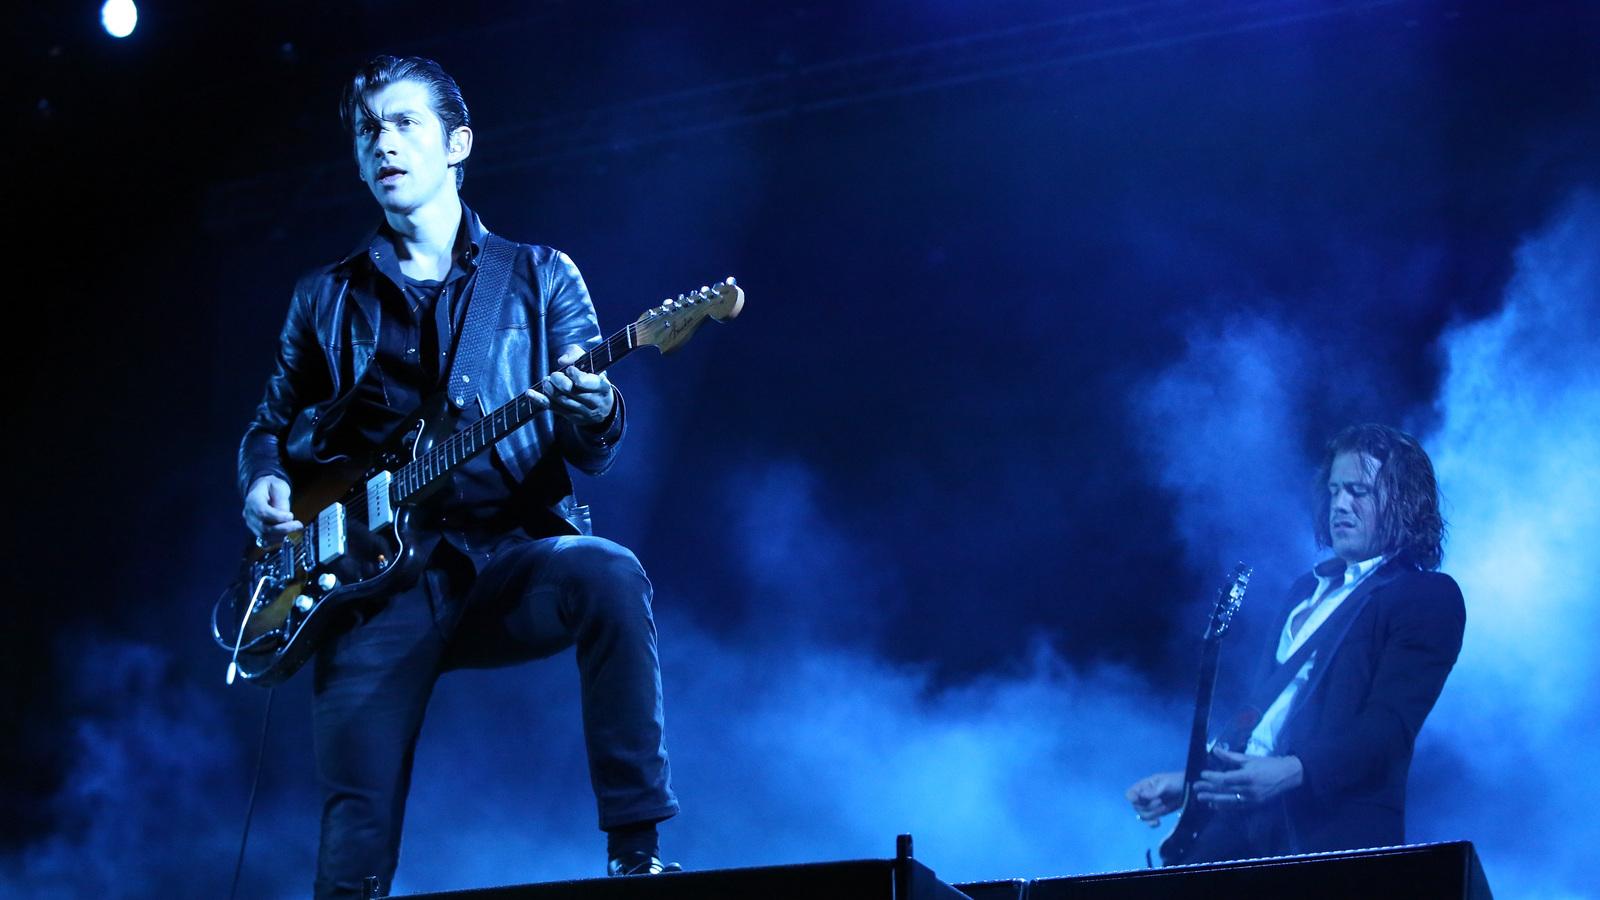 Arctic Monkeys announce some USA dates